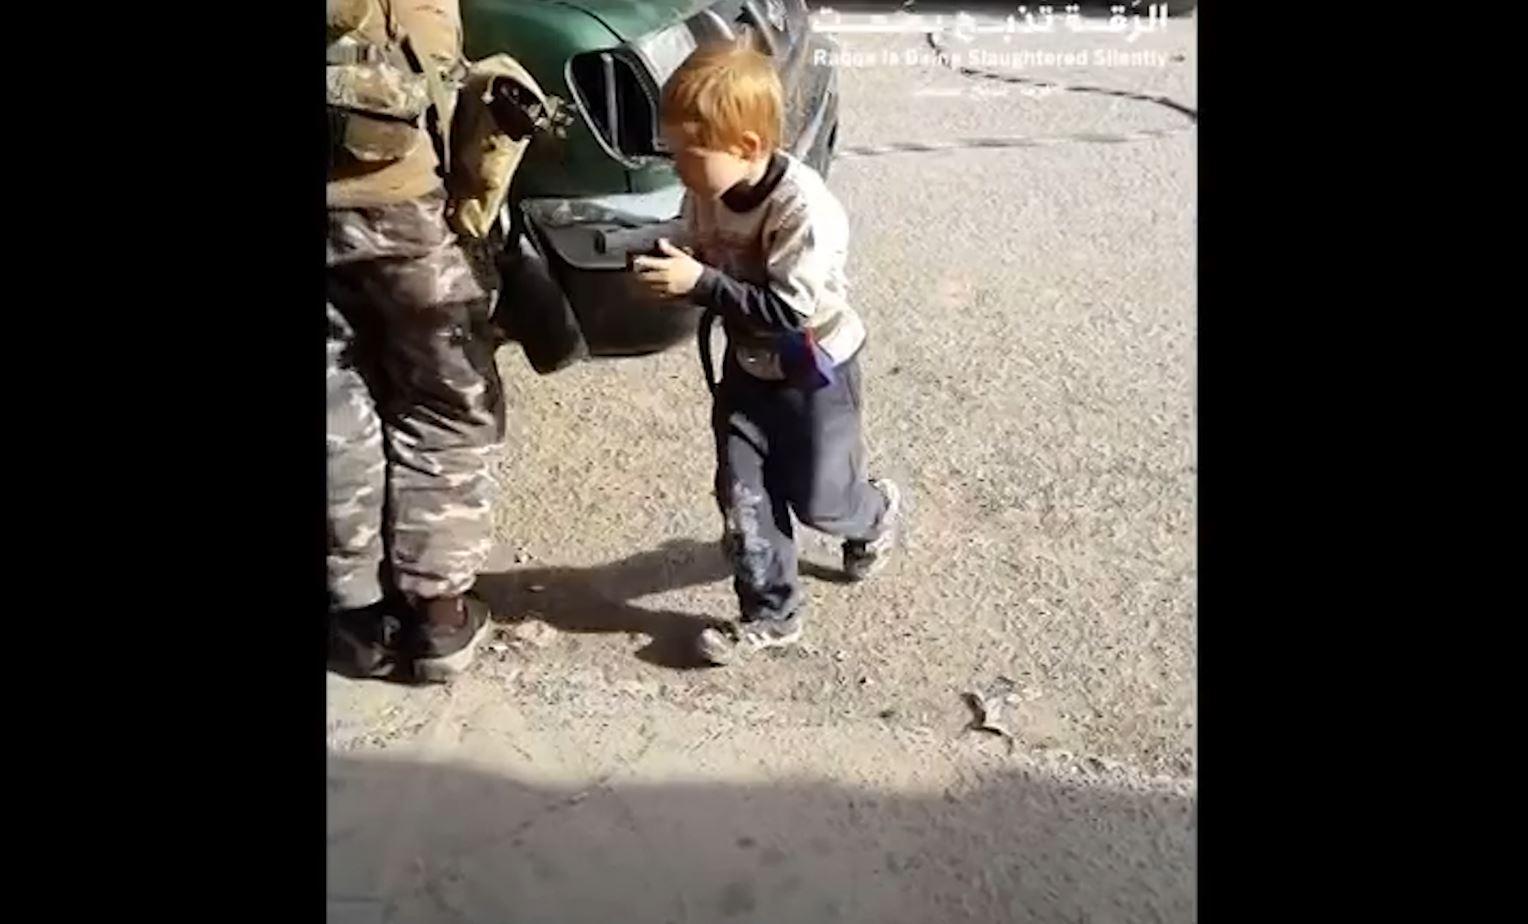 Isis Jihadists Train Children to Kill in Chilling Video